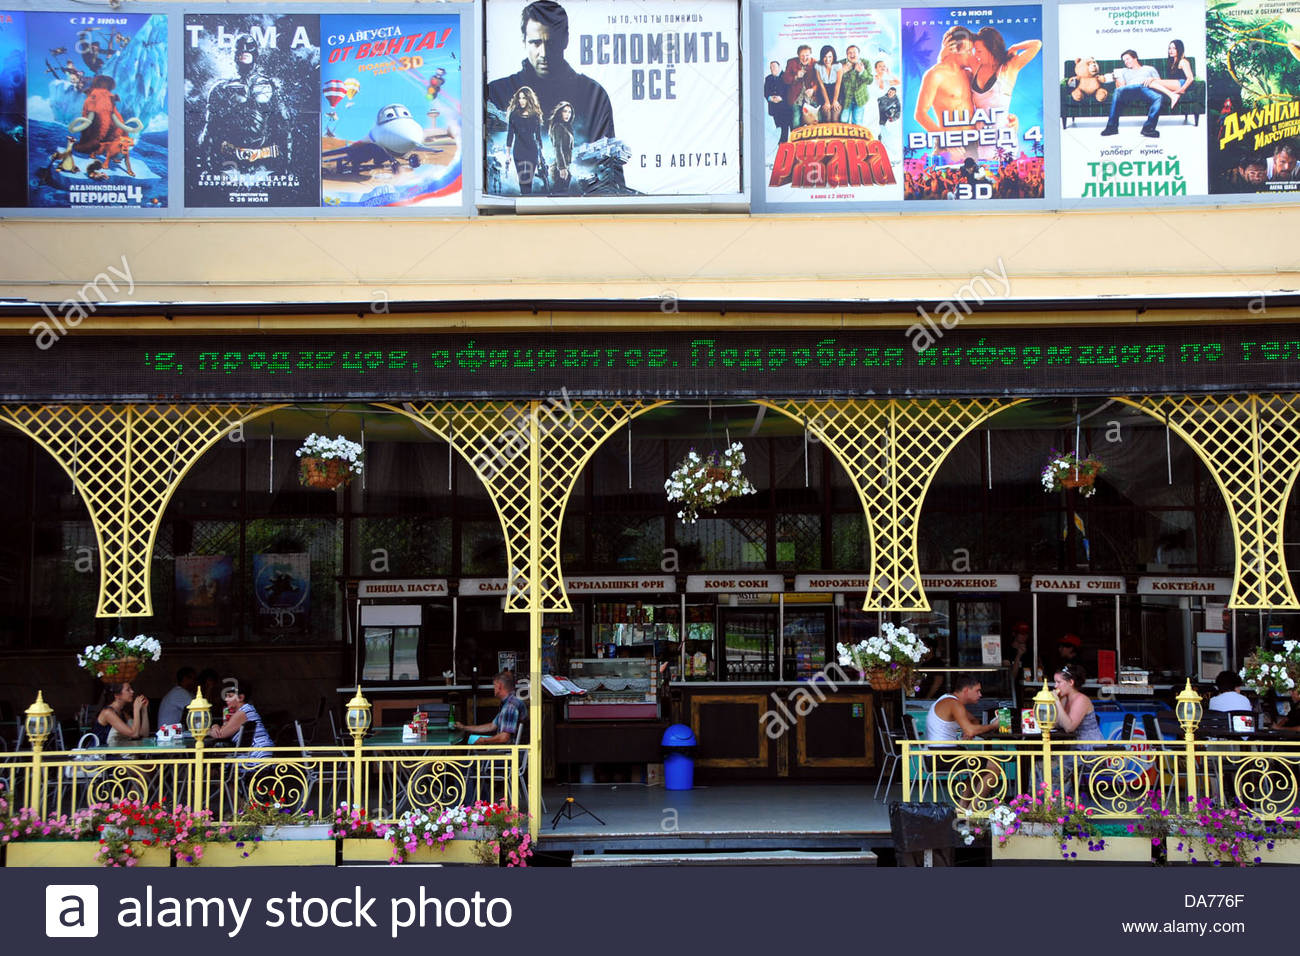 restaurant and cinema,khabarovsk,russia - Stock Image